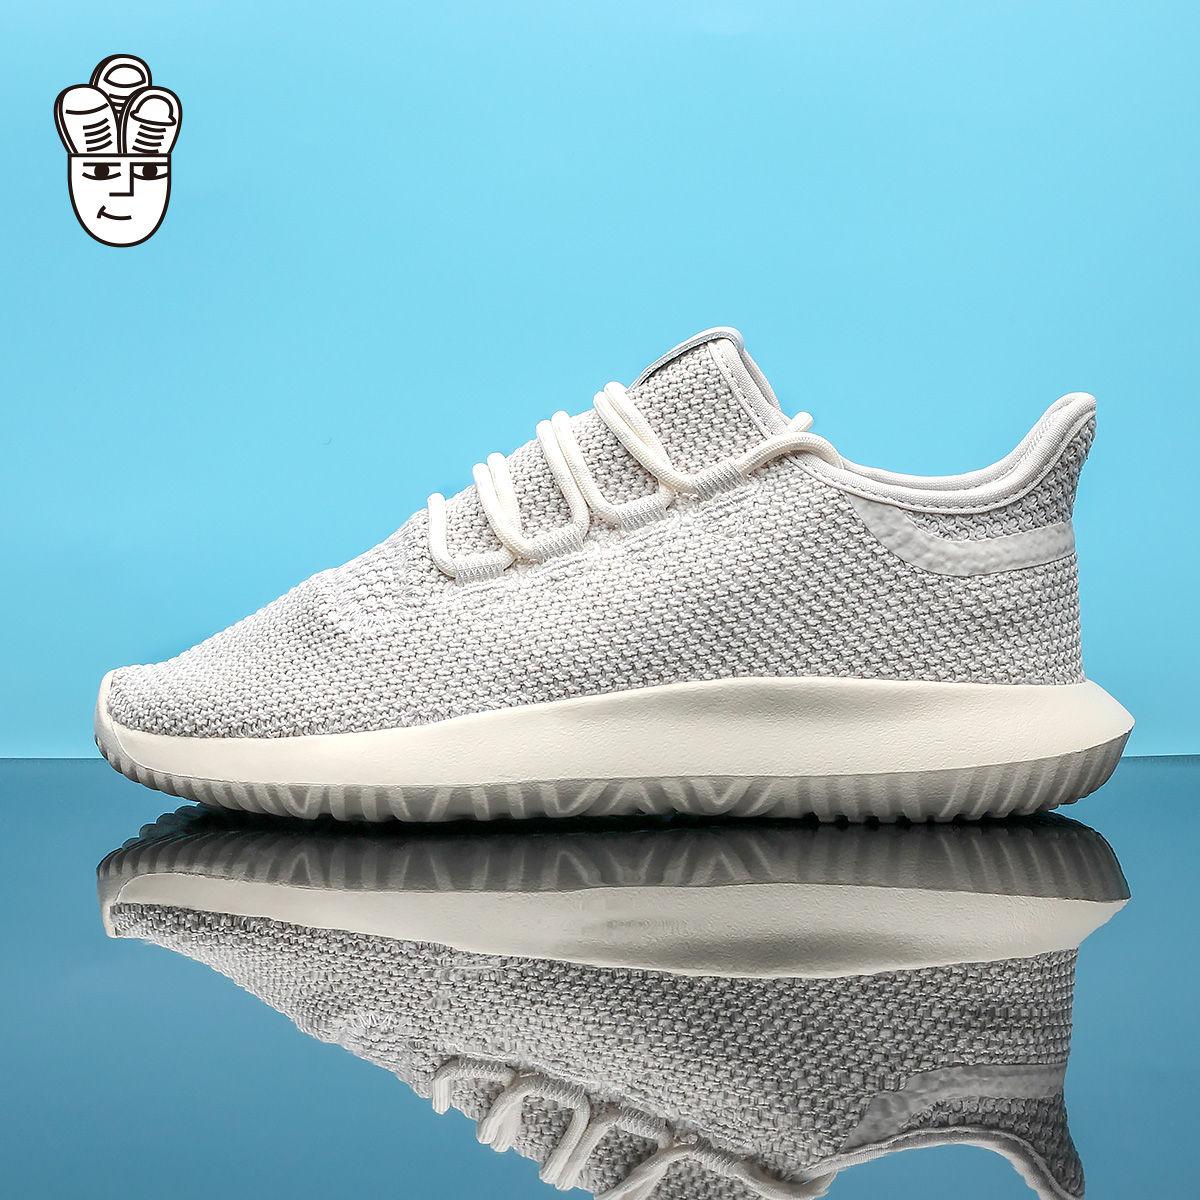 Adidas Tubular Shadow 三叶草男鞋女鞋GS 编织休闲鞋 简版小椰子